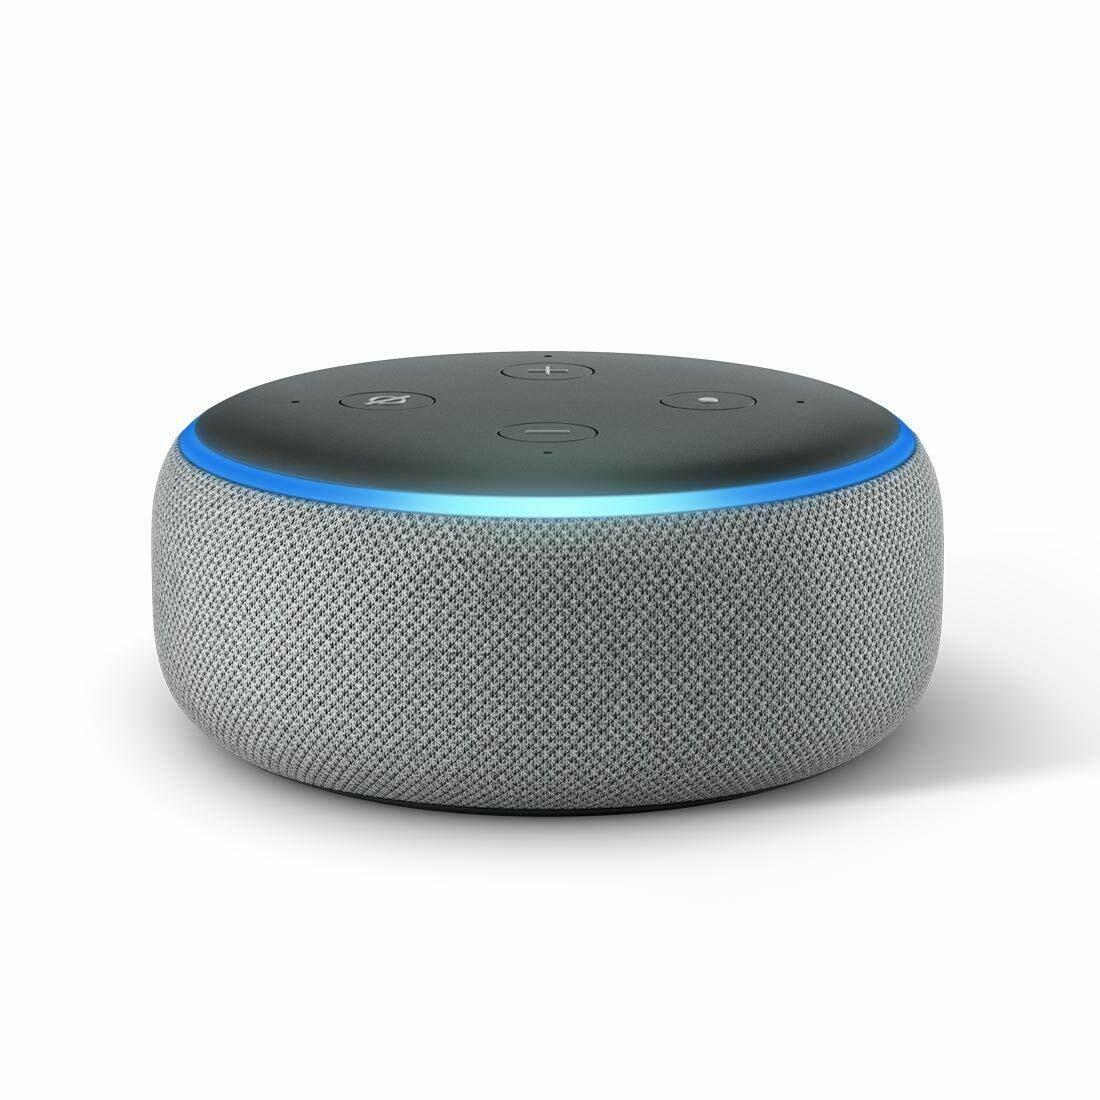 Amazon Echo Dot, 3rd Generation, Grey